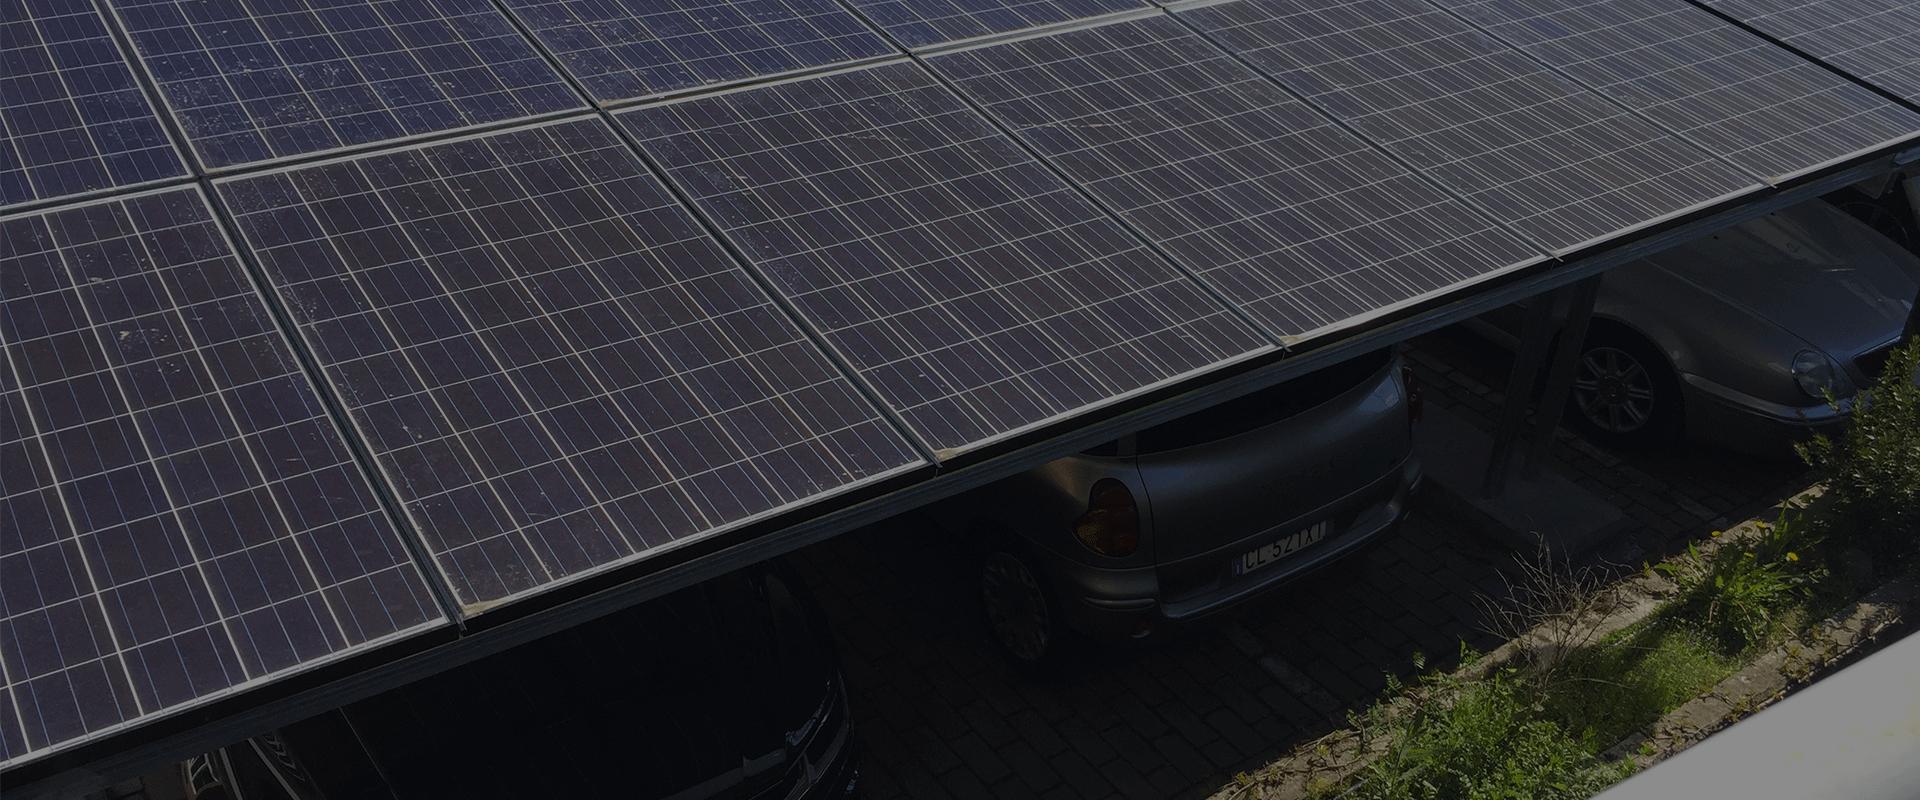 Impianti fotovoltaici nel sud italia